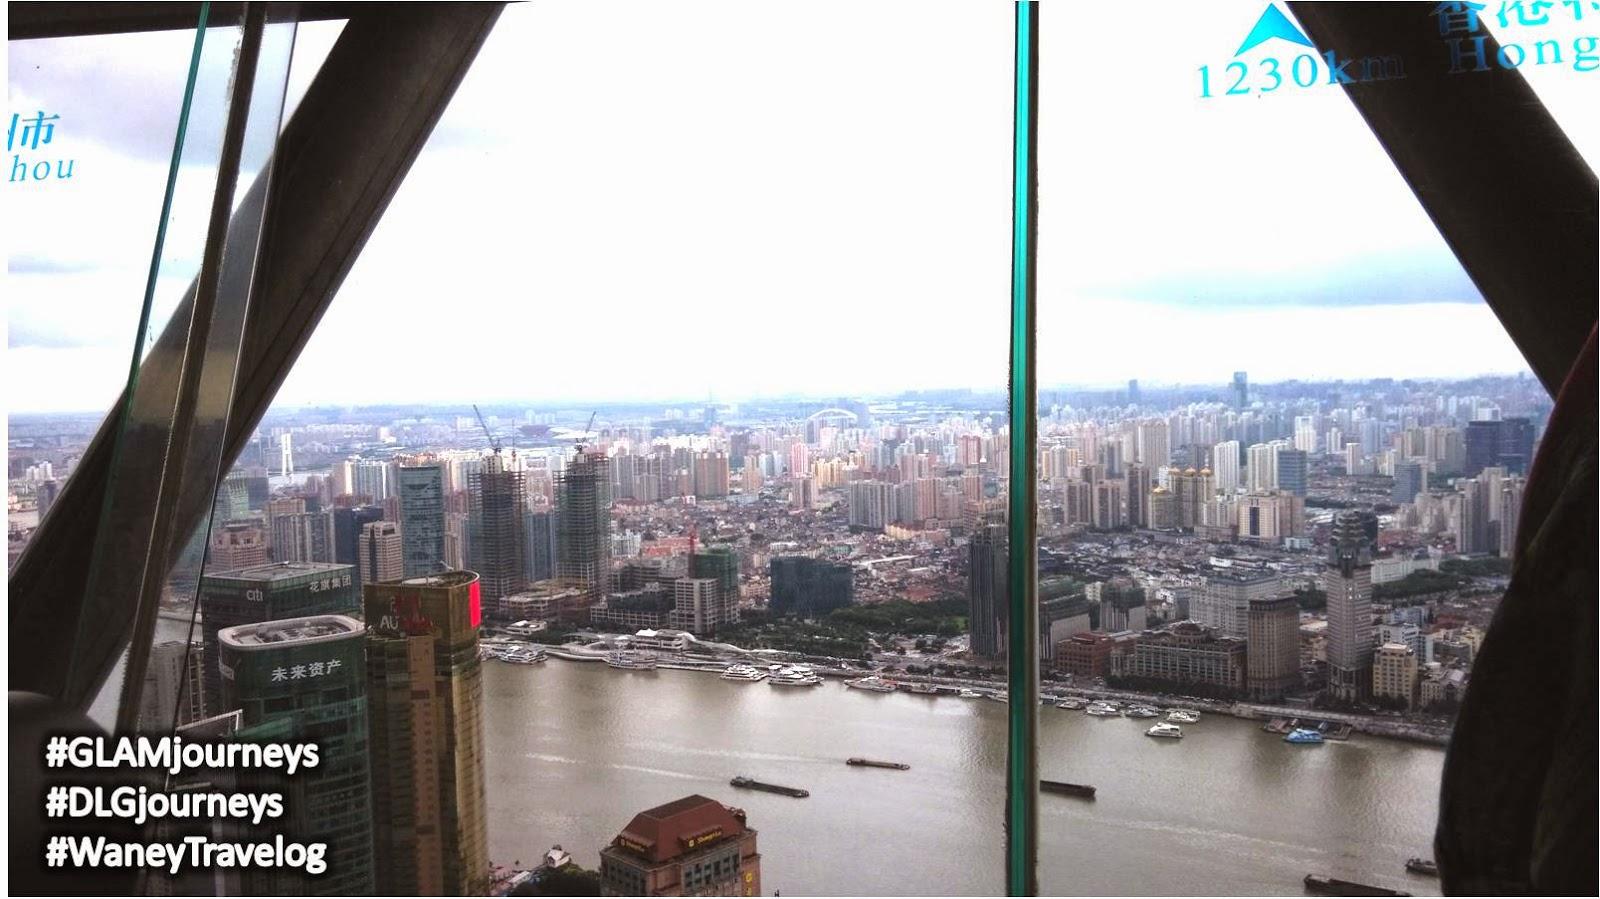 Oriental Pearl Tower Shannghai, Oriental Pearl see through glass floor, Shanghai Aku Datang, Waney Travelog, Glam Journeys, DLG Journeys, cuti-cuti Malaysia, melancong percuma, pakej pelancongan ke Shanghai, Shanghai holiday package, Waney Zainuddin, Huangpu River